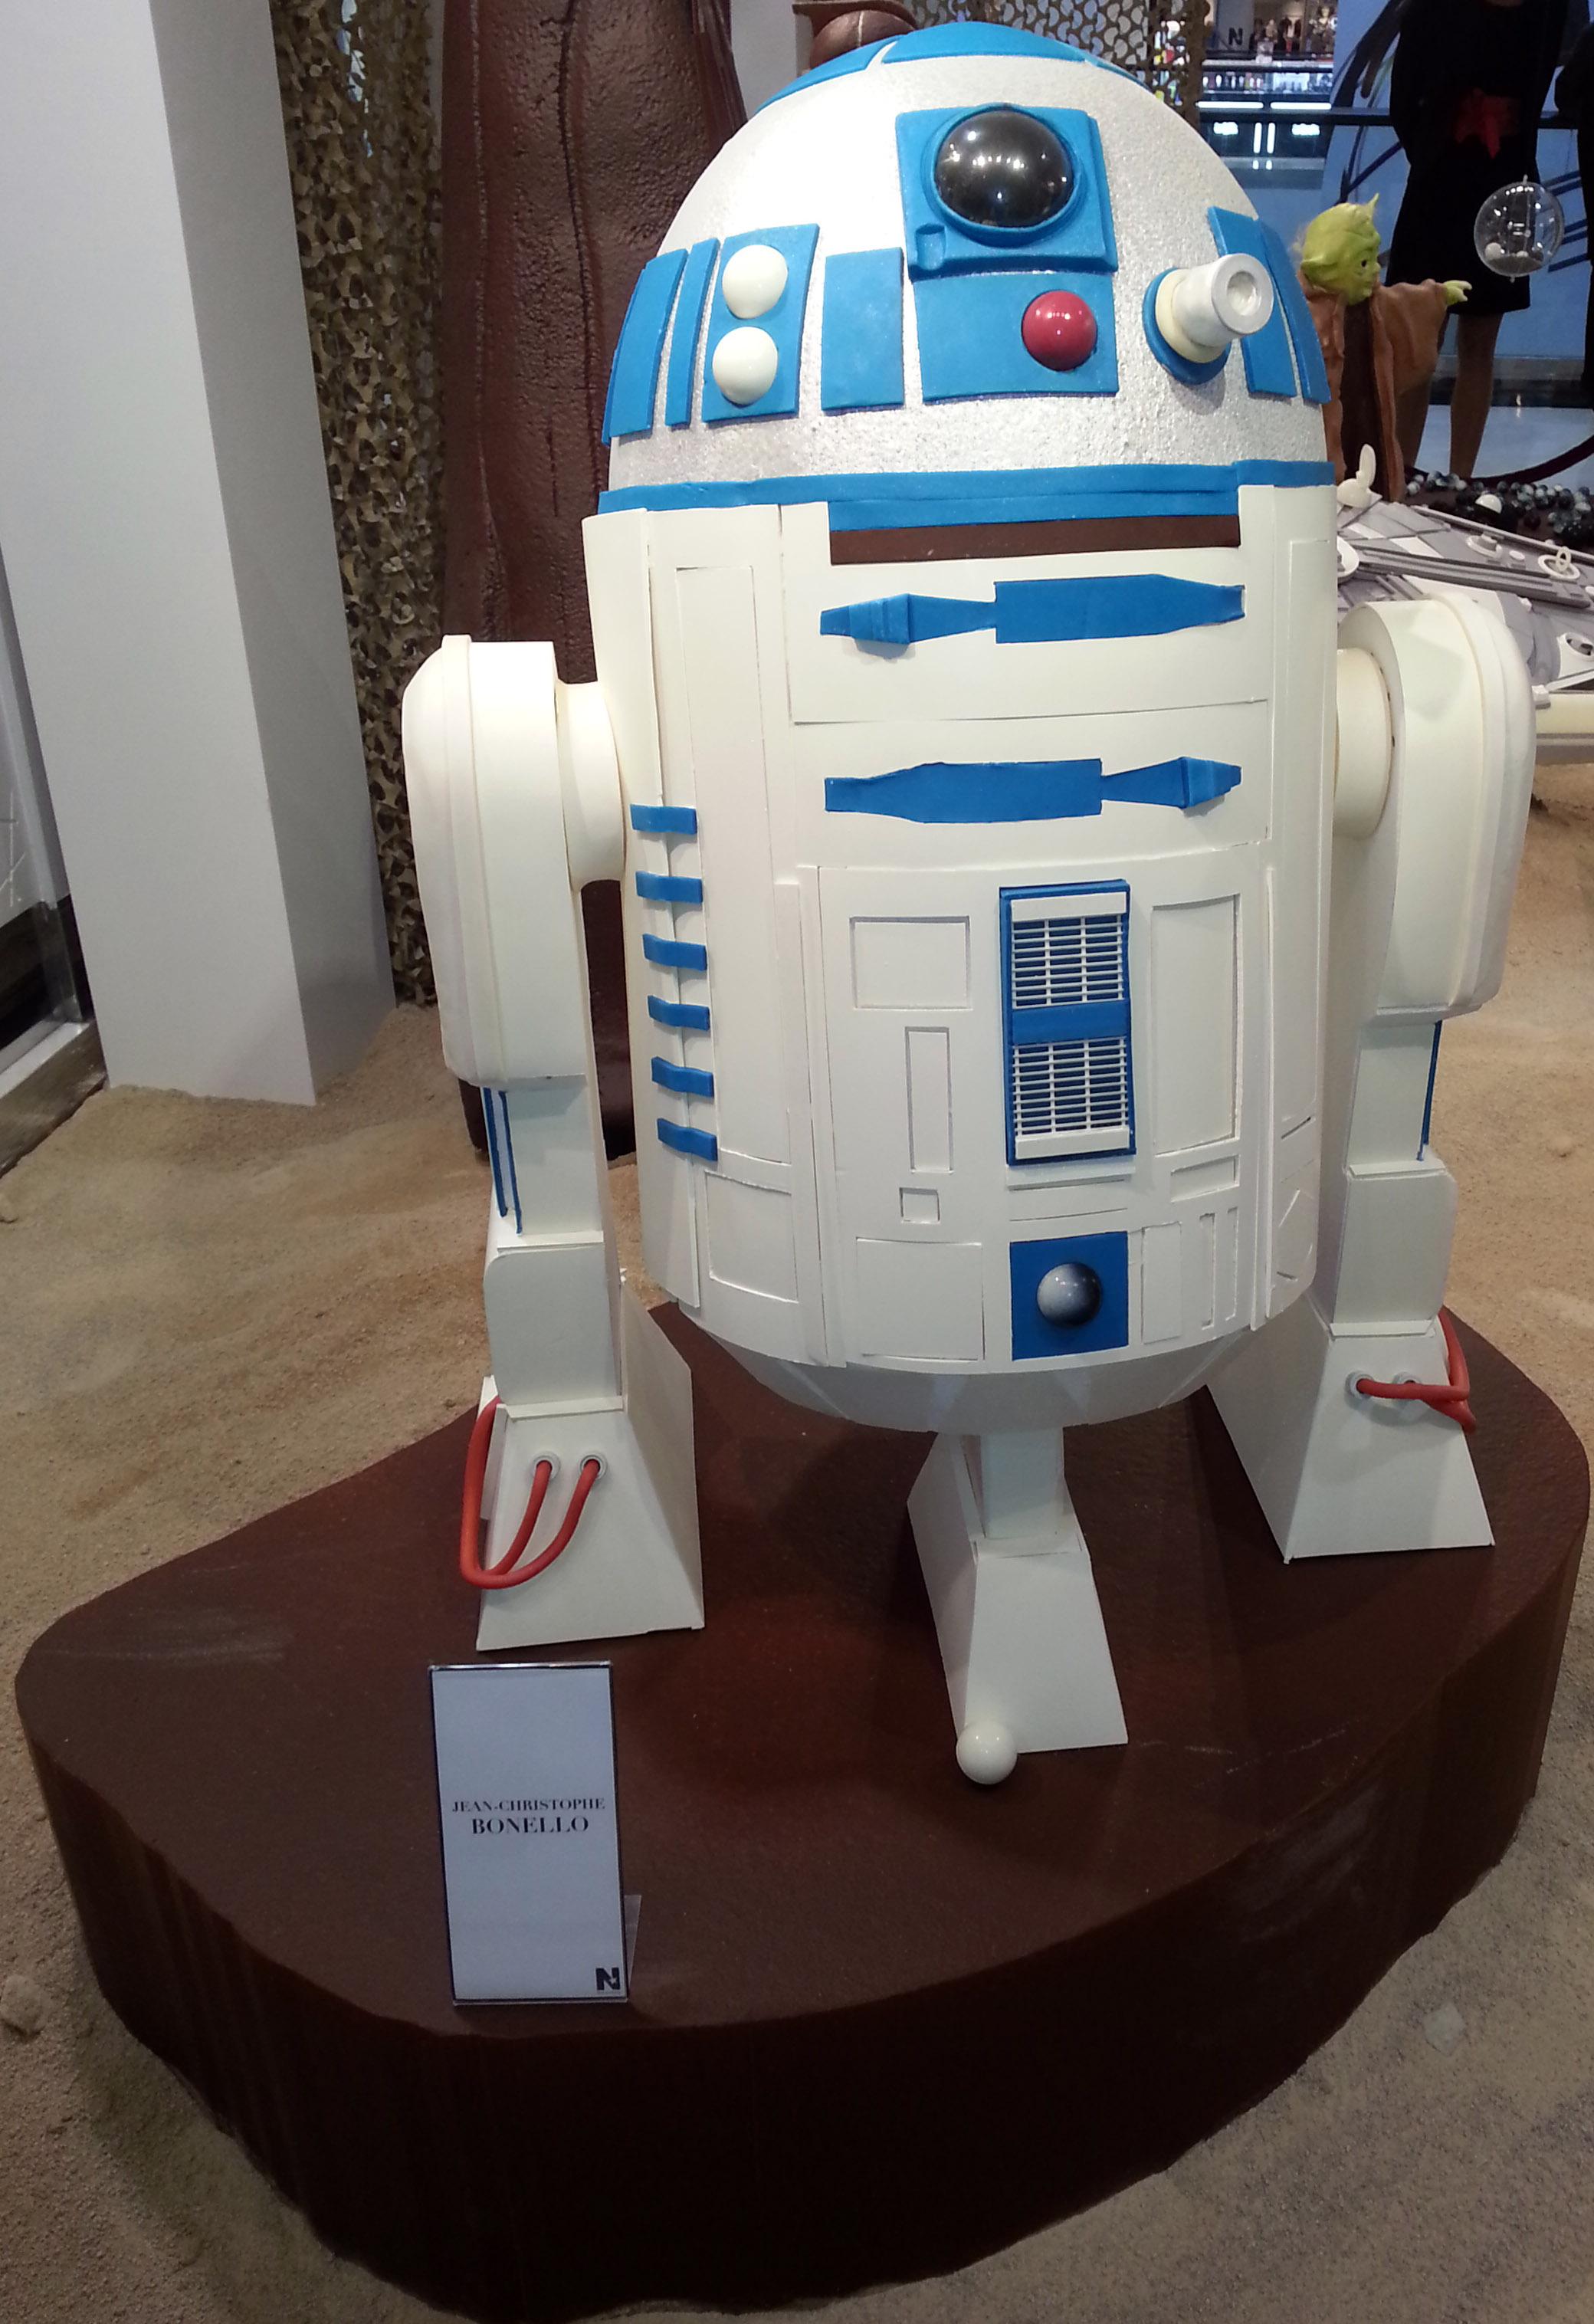 R2 D2 survivant des 6 films de la saga